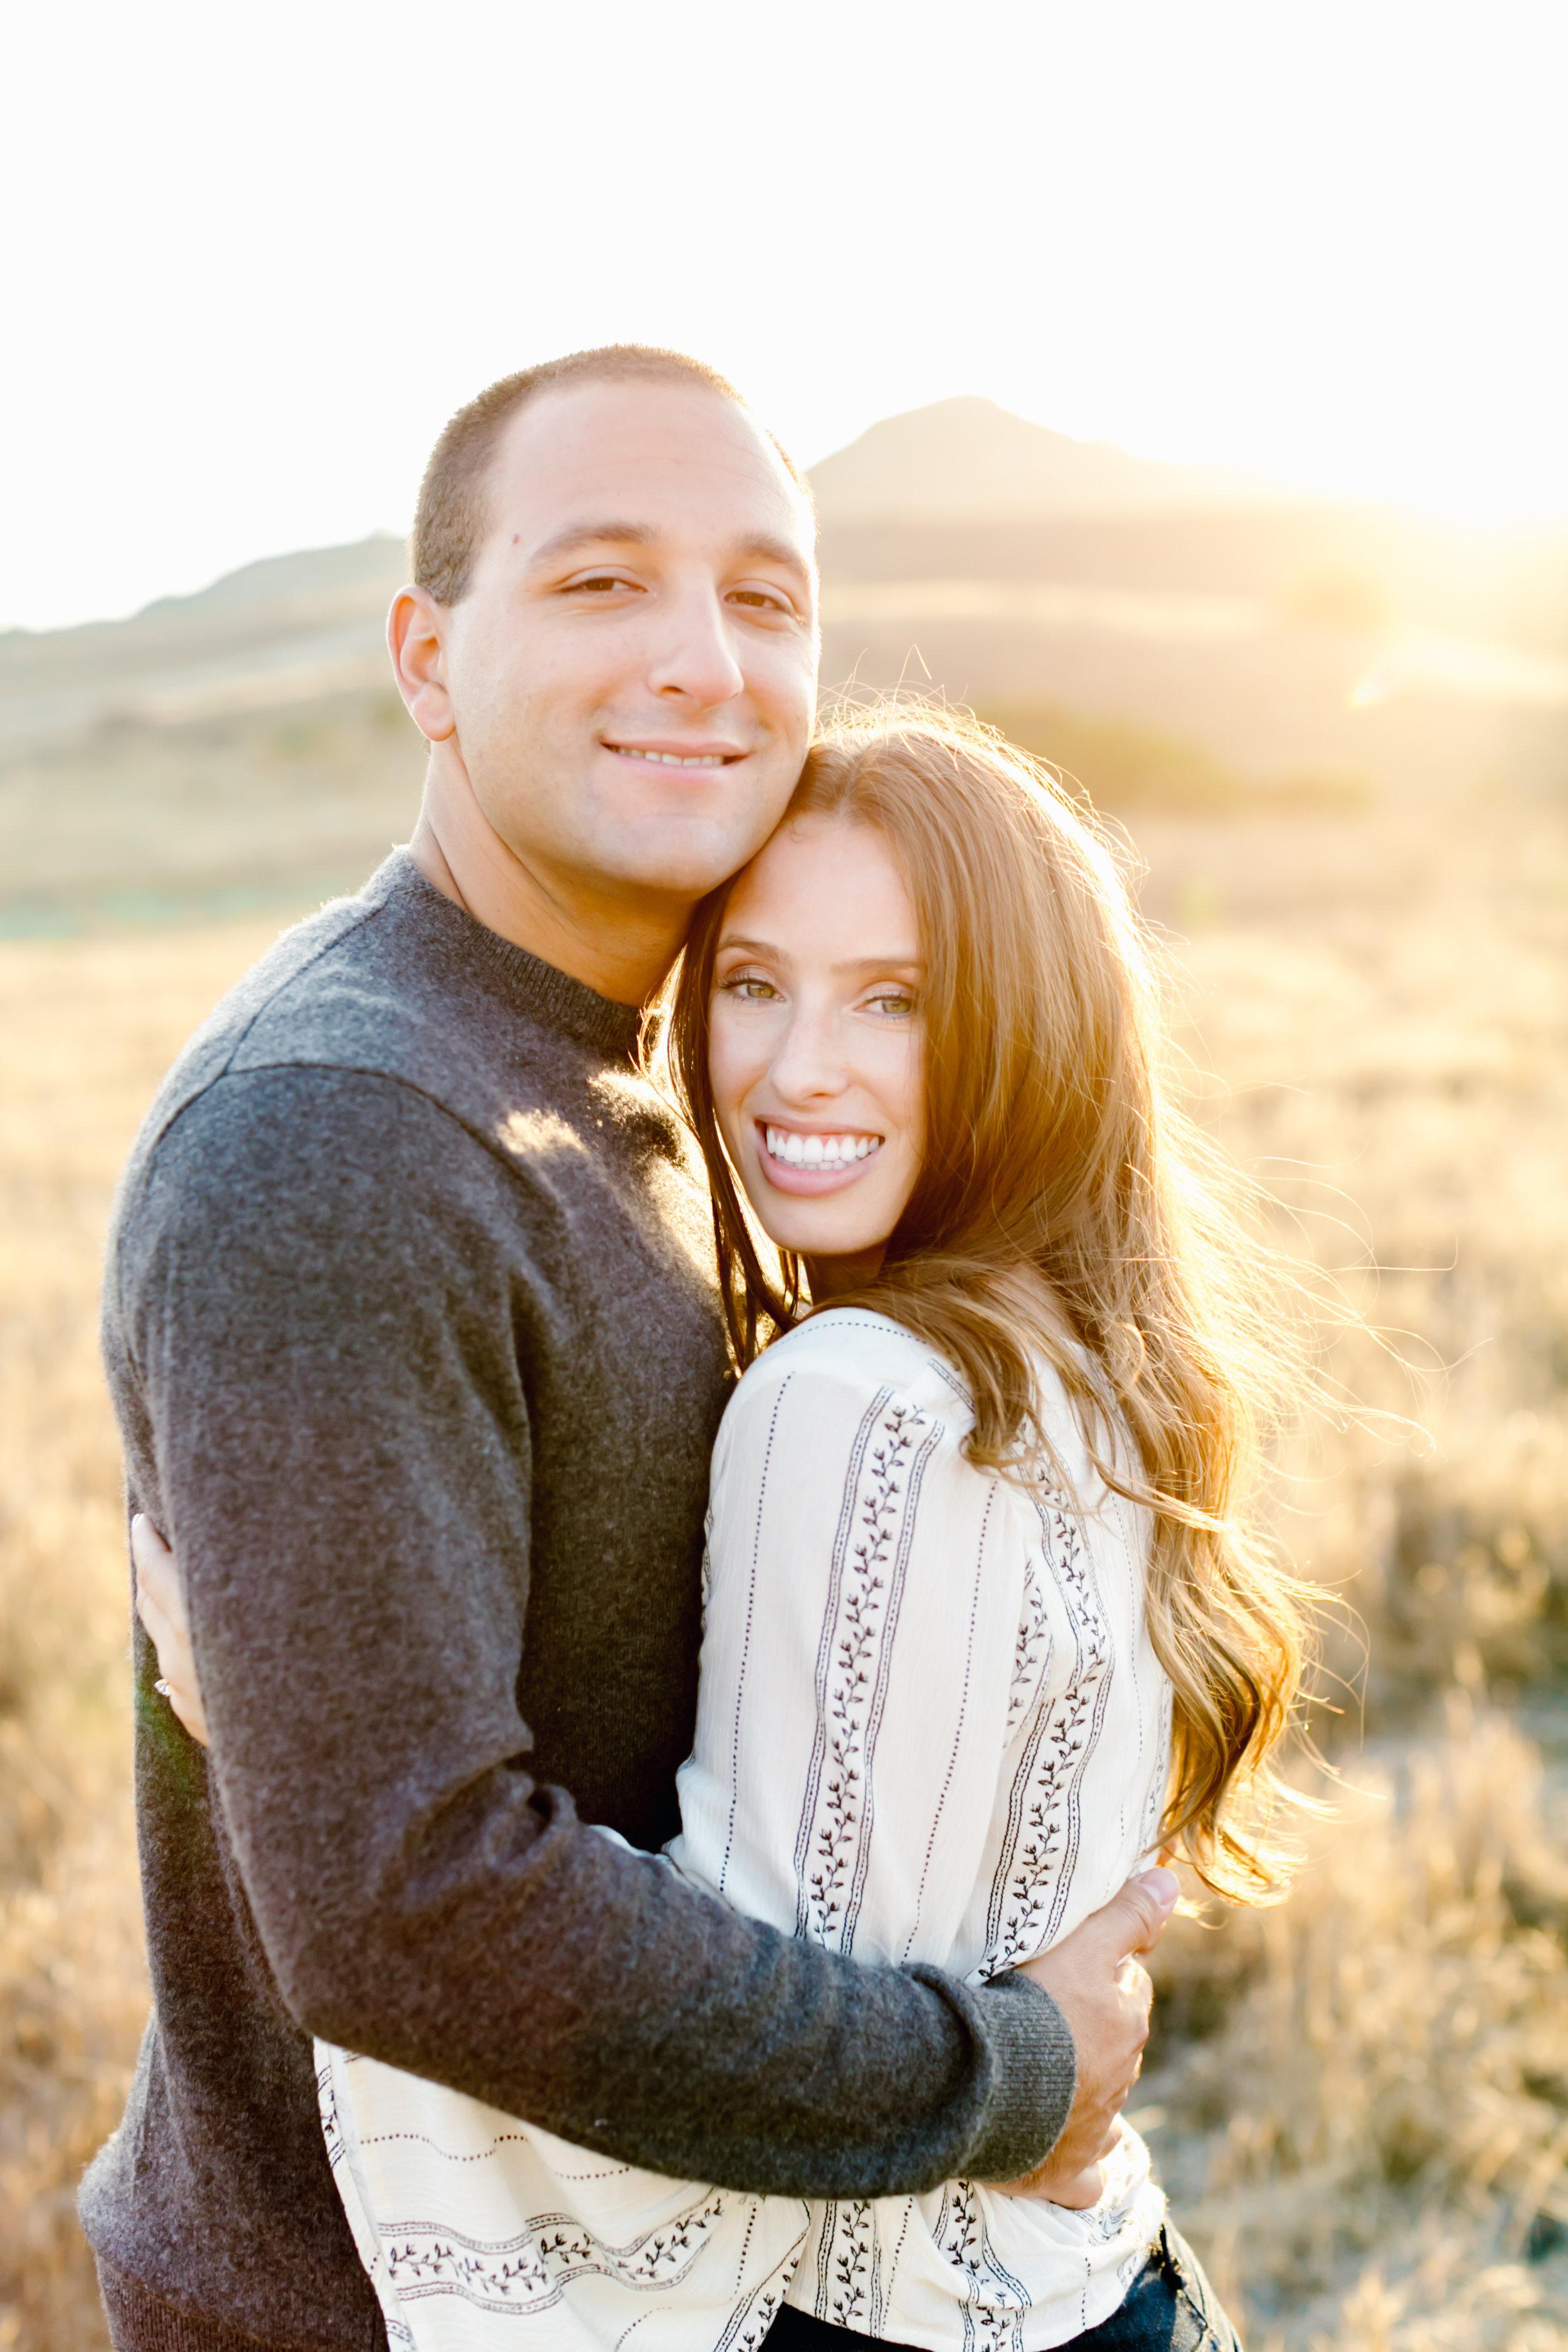 Natalie Schutt Photography - Austin & Nicole's Engagement-68.JPG